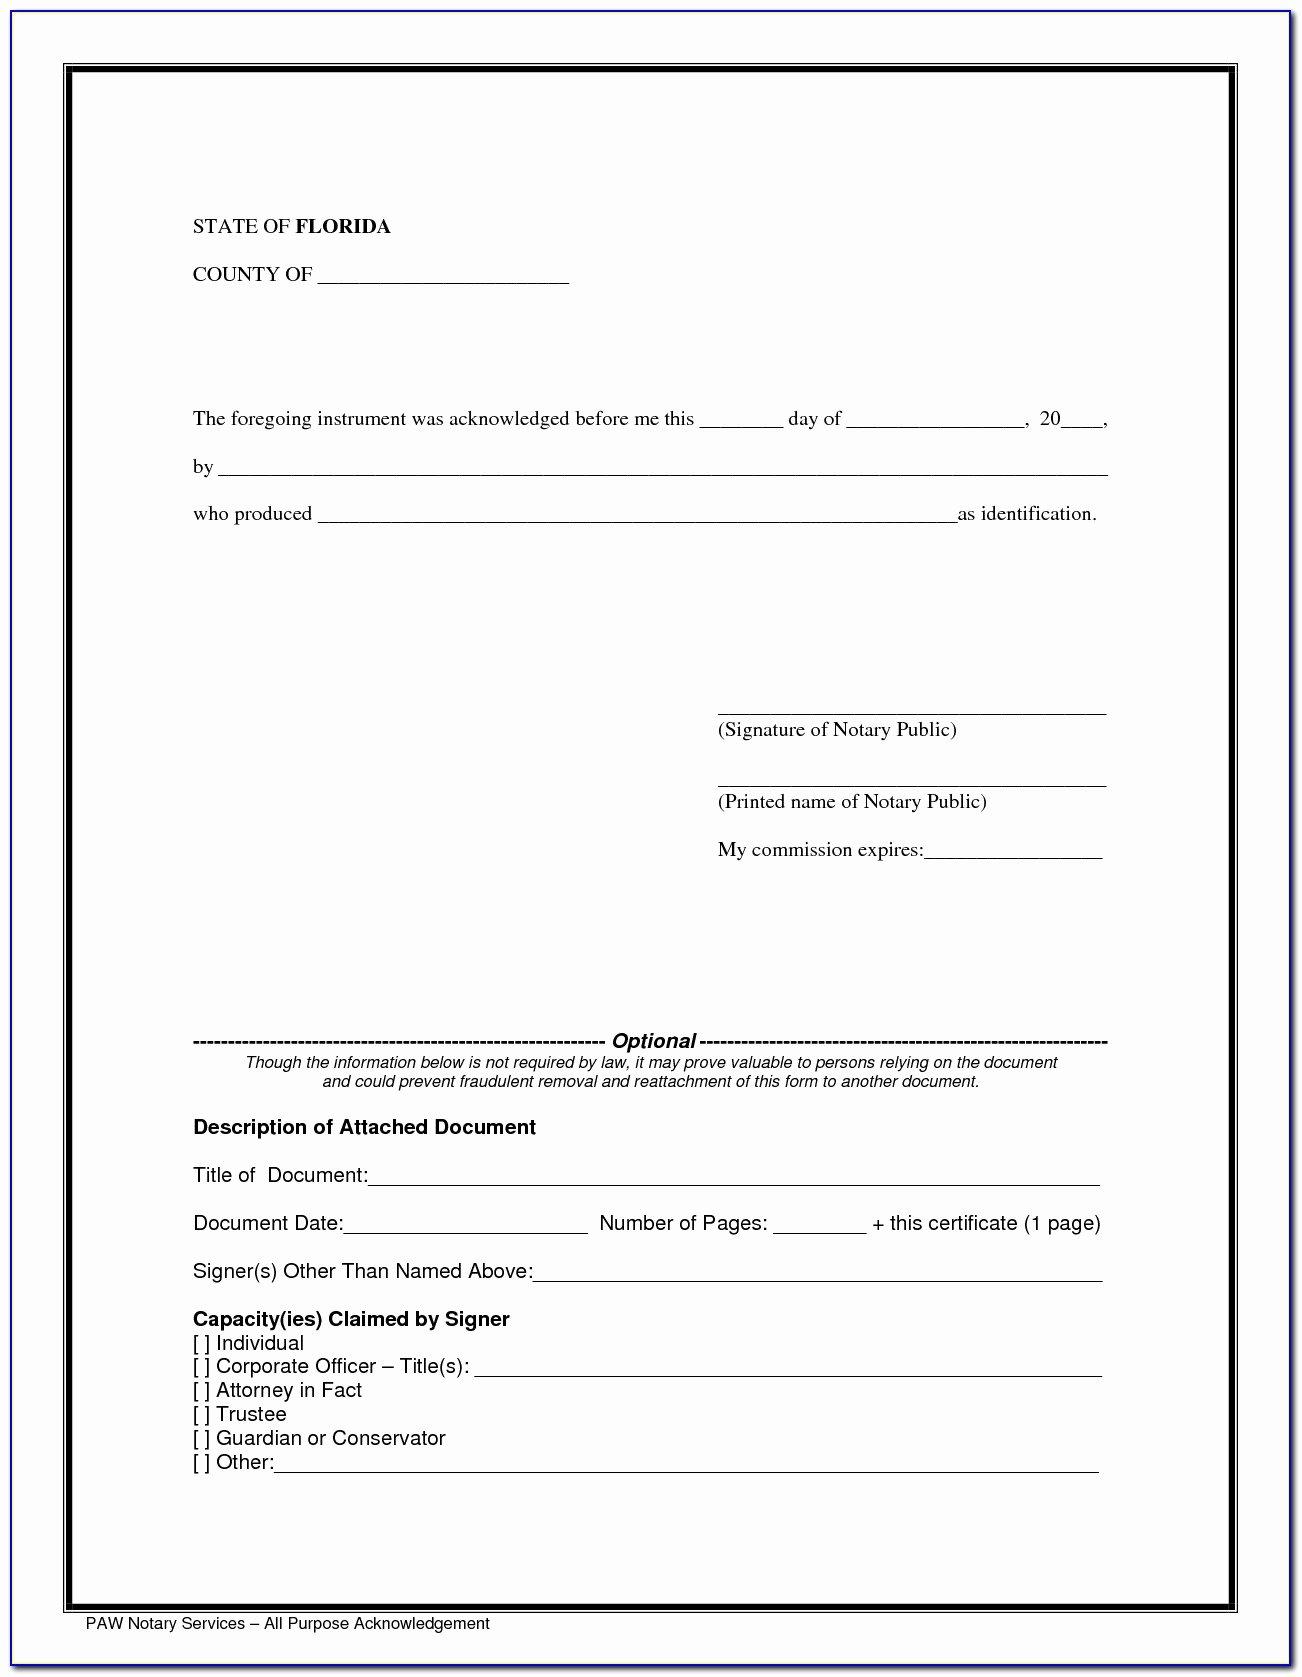 Notary Signature Block Template Luxury Notary Public Signature Line Template Free Templates Block